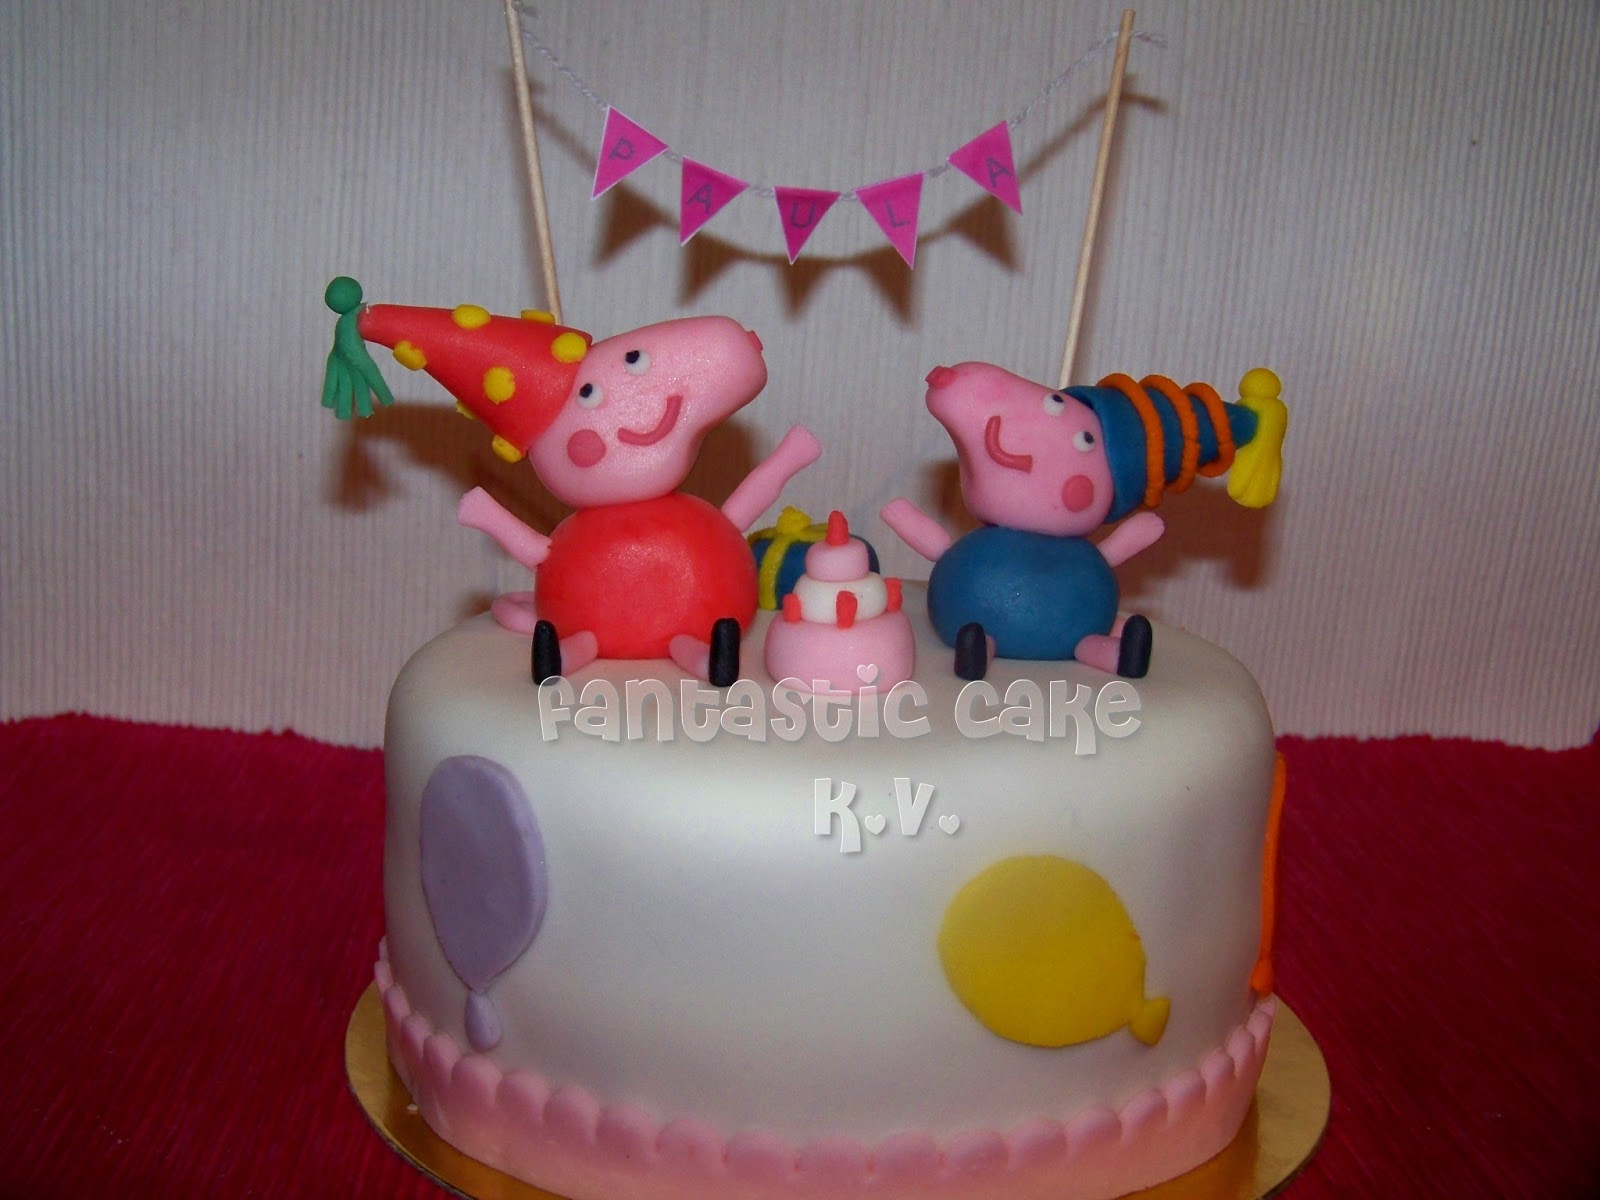 Tarta Peppa Pig Cocina / General Fantasticcake